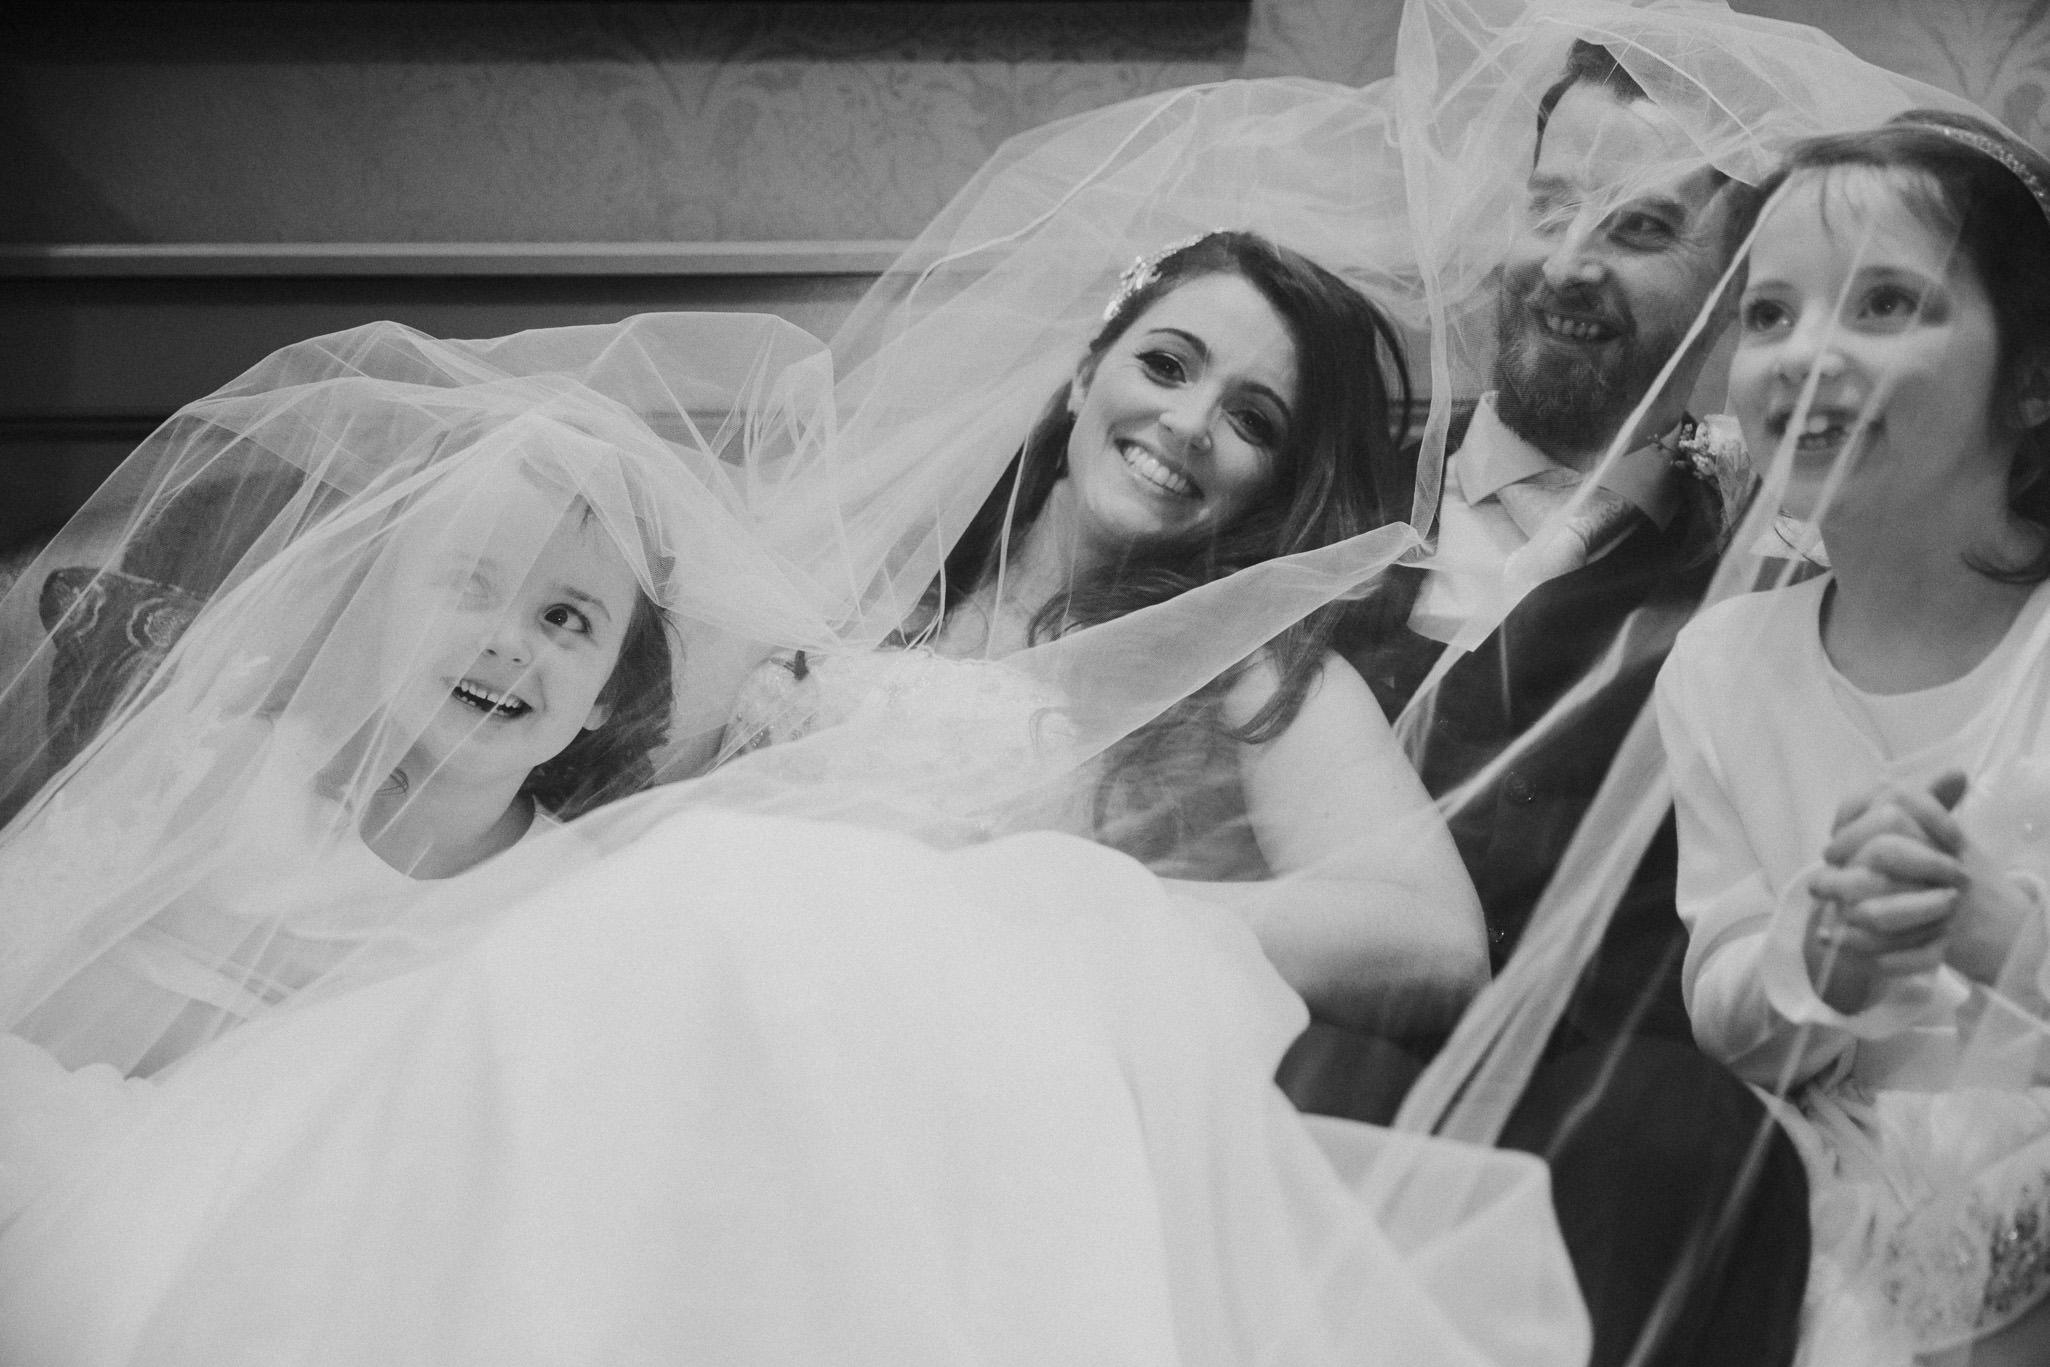 clairebyrnephotography-wedding-night-sparklers-new-years-eve-denyce-leonard-17.jpg